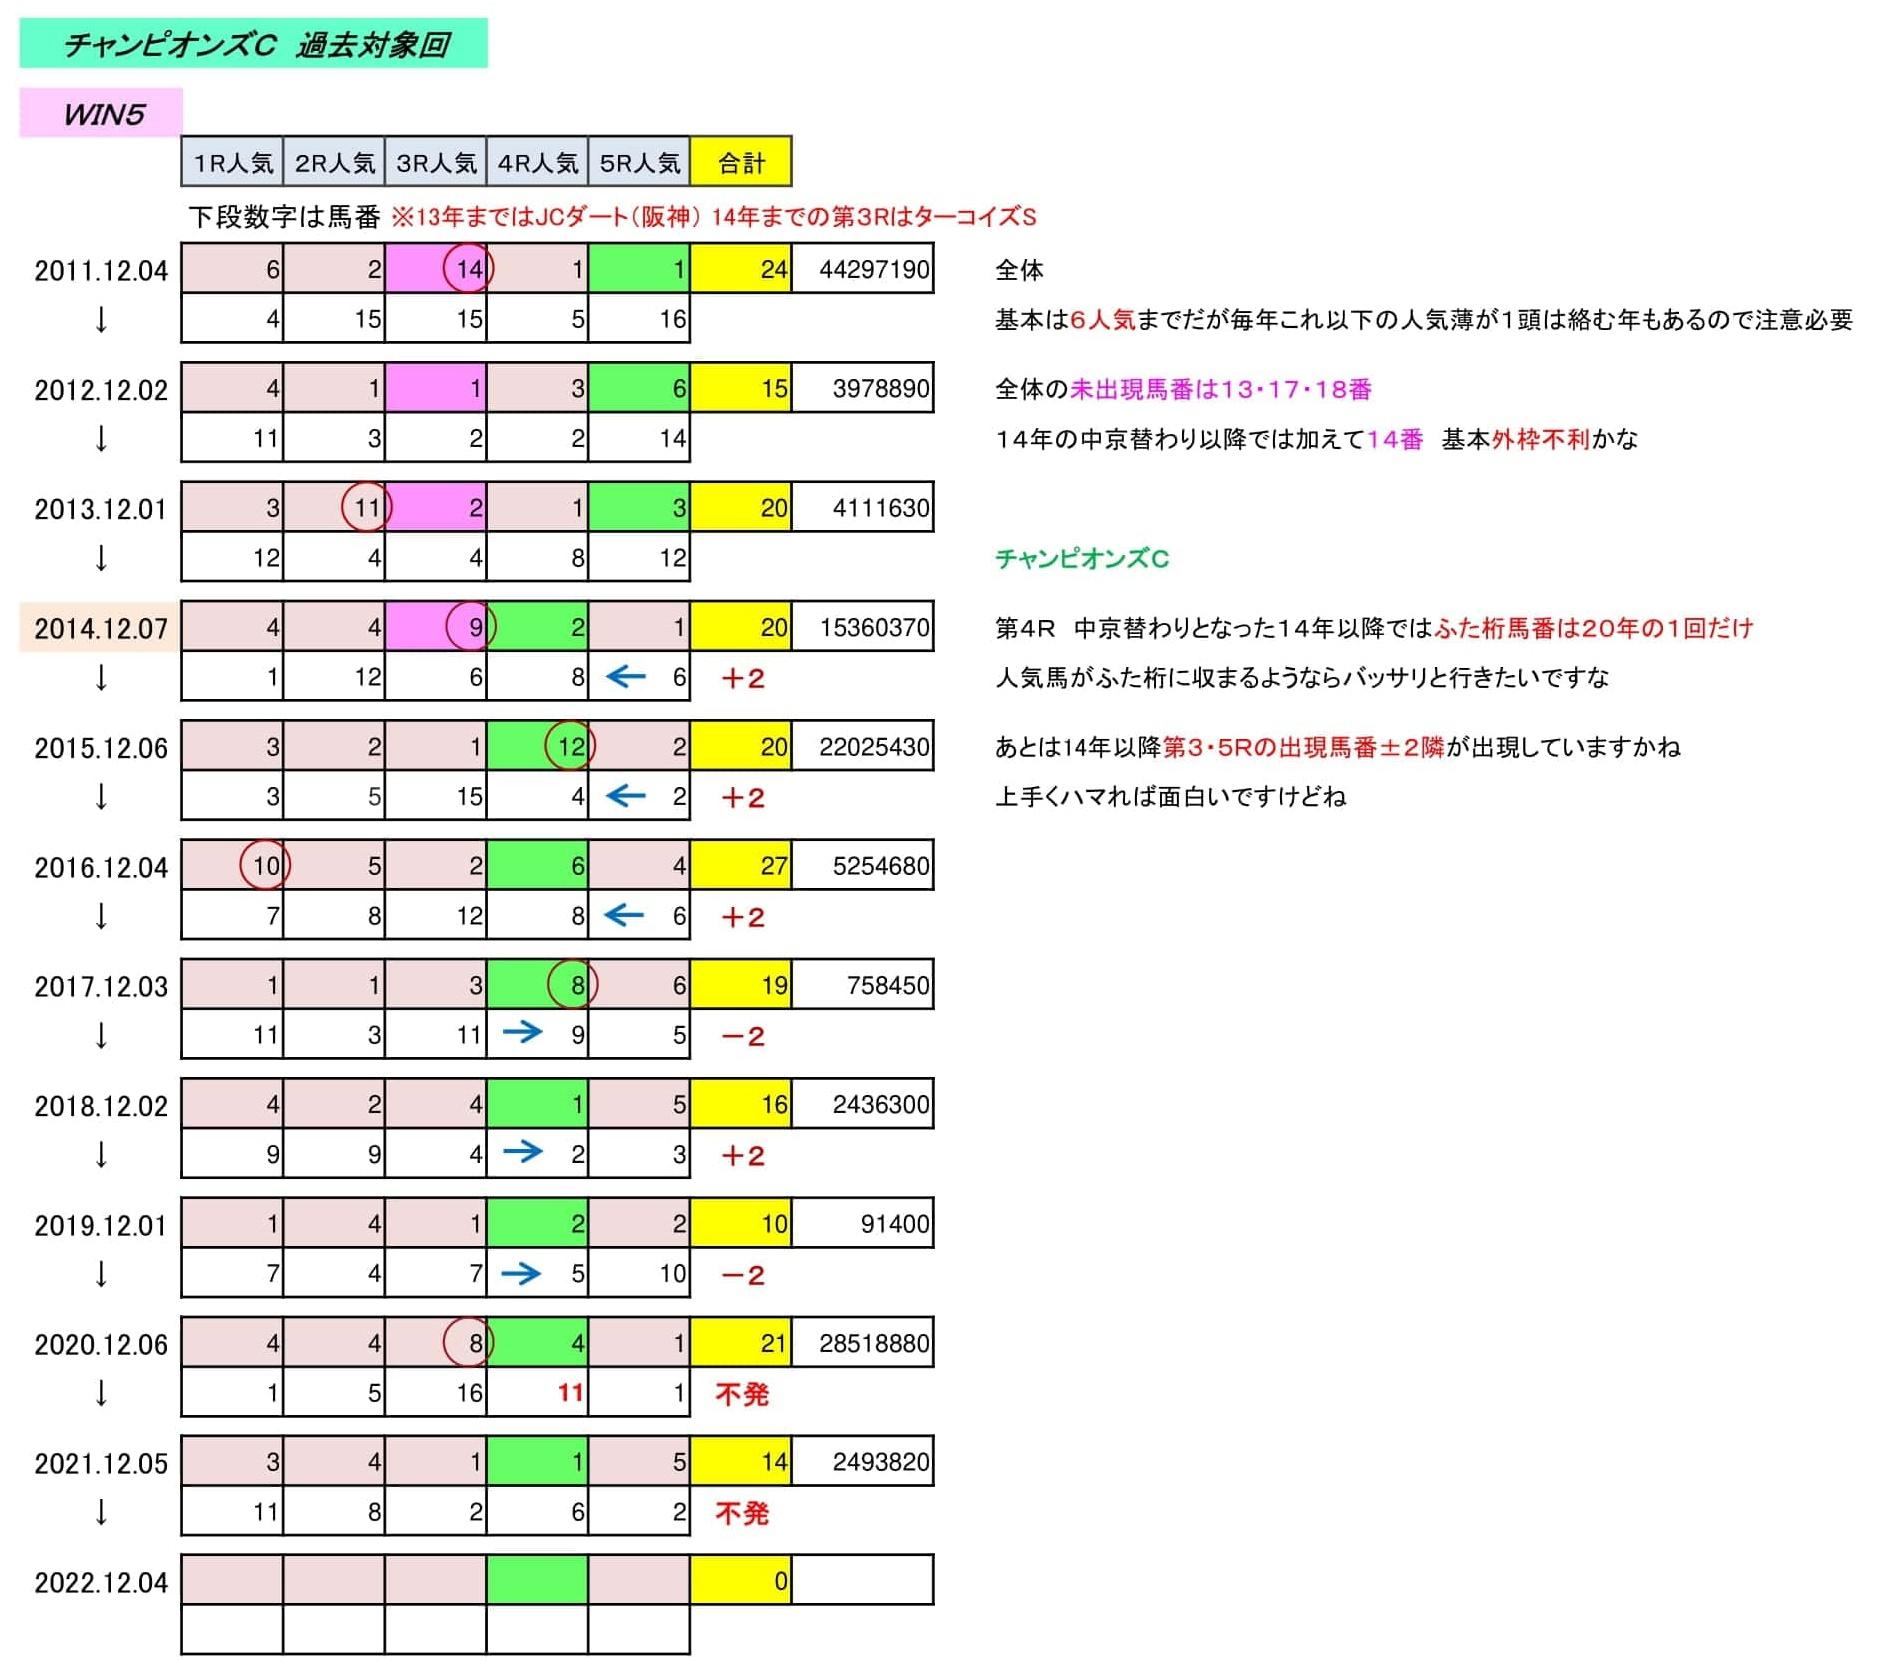 12_4_win5a.jpg